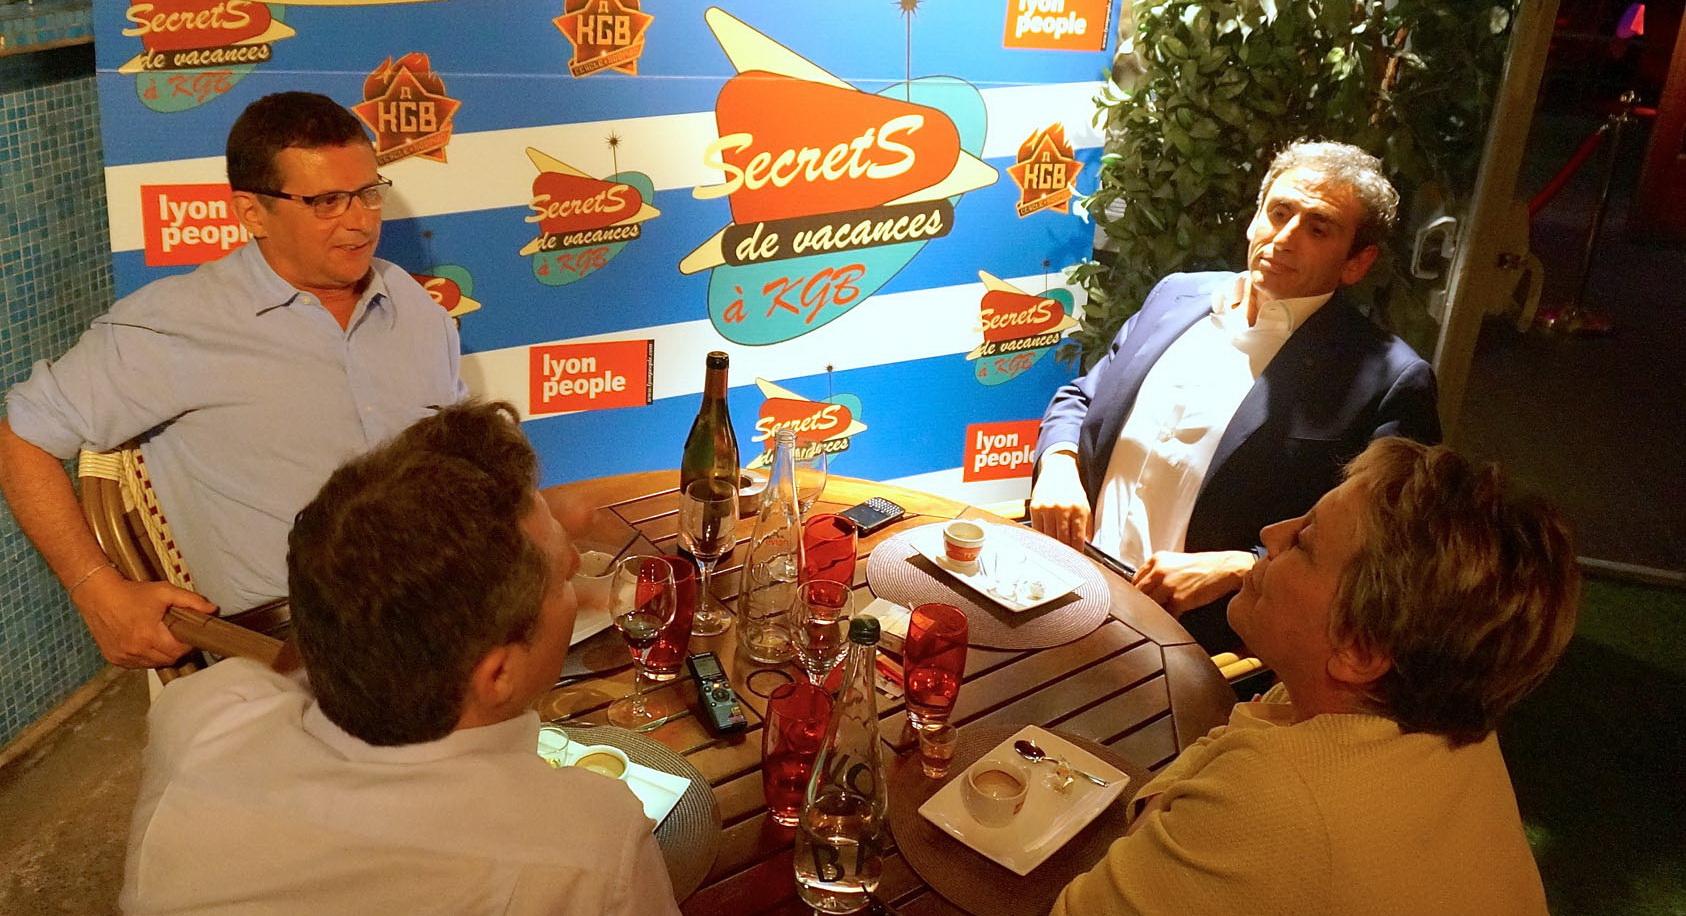 Silvio Iacovino et Eric Giraud. Secrets de vacances à KGB